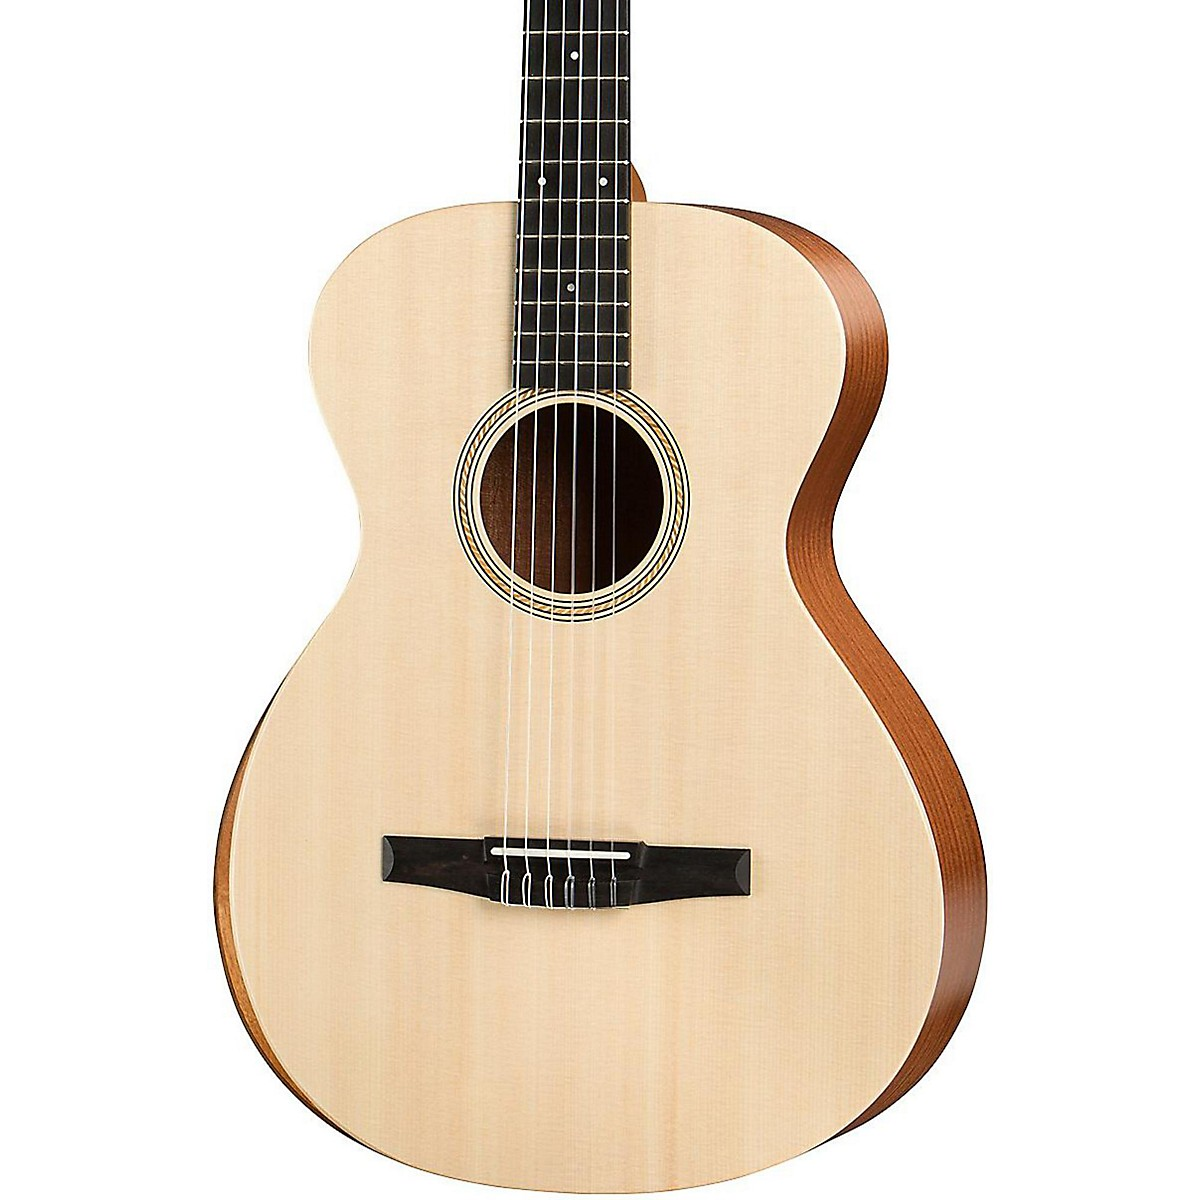 Taylor Academy 12e-N Grand Concert Nylon String Acoustic Guitar